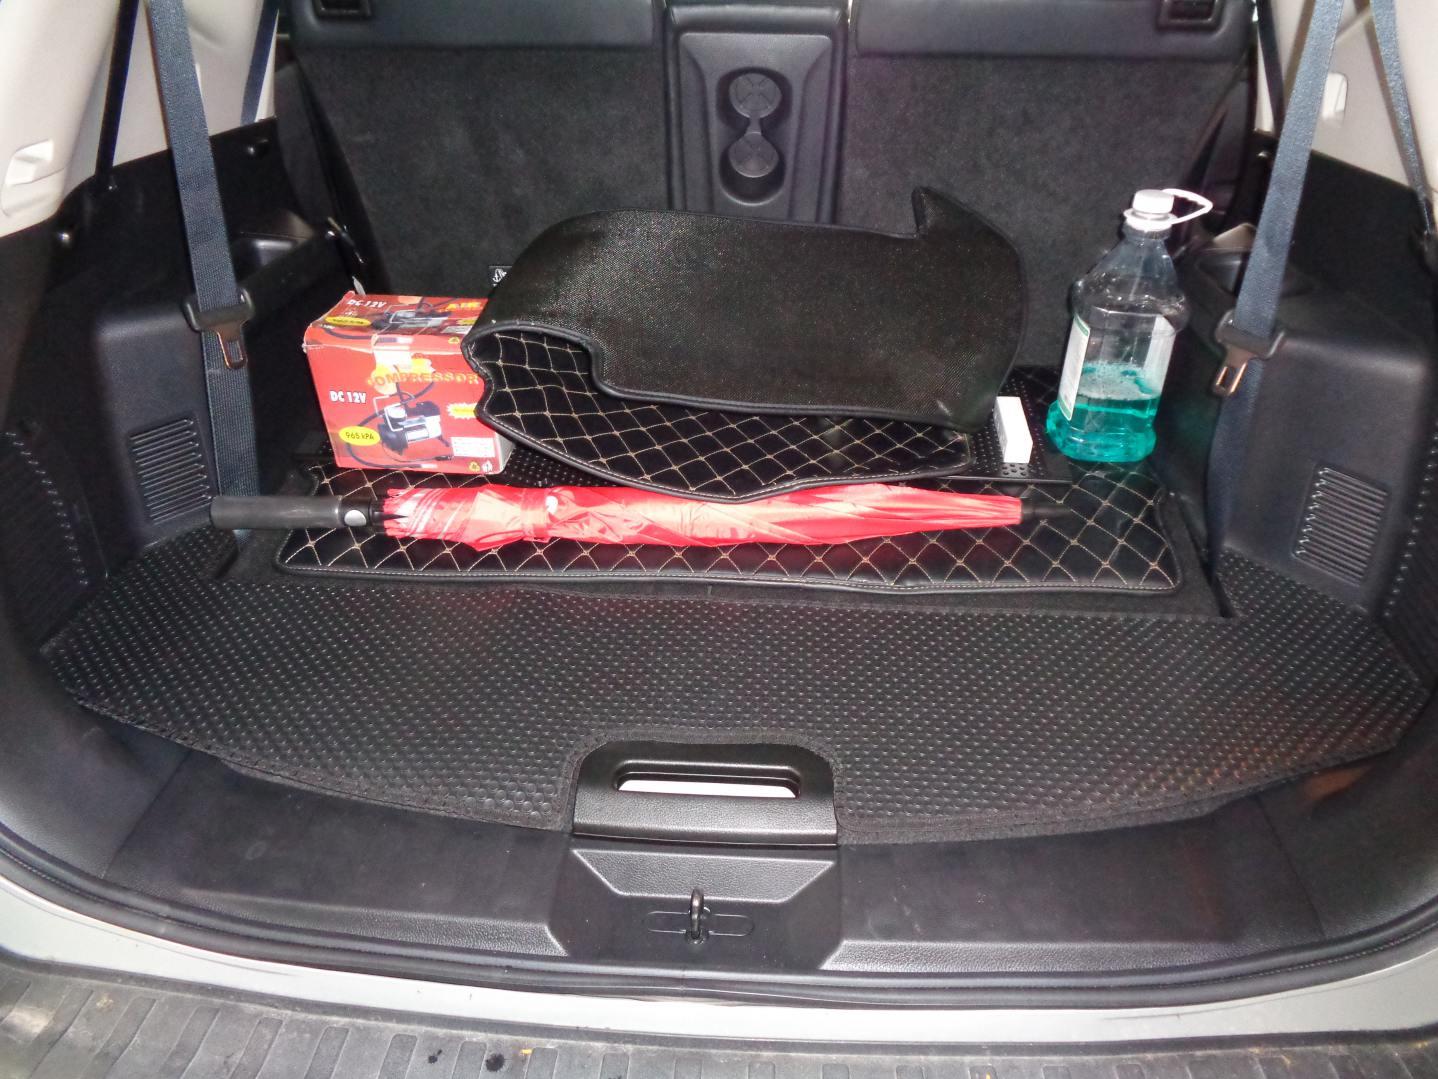 Thảm lót cốp Nissan Xtrail